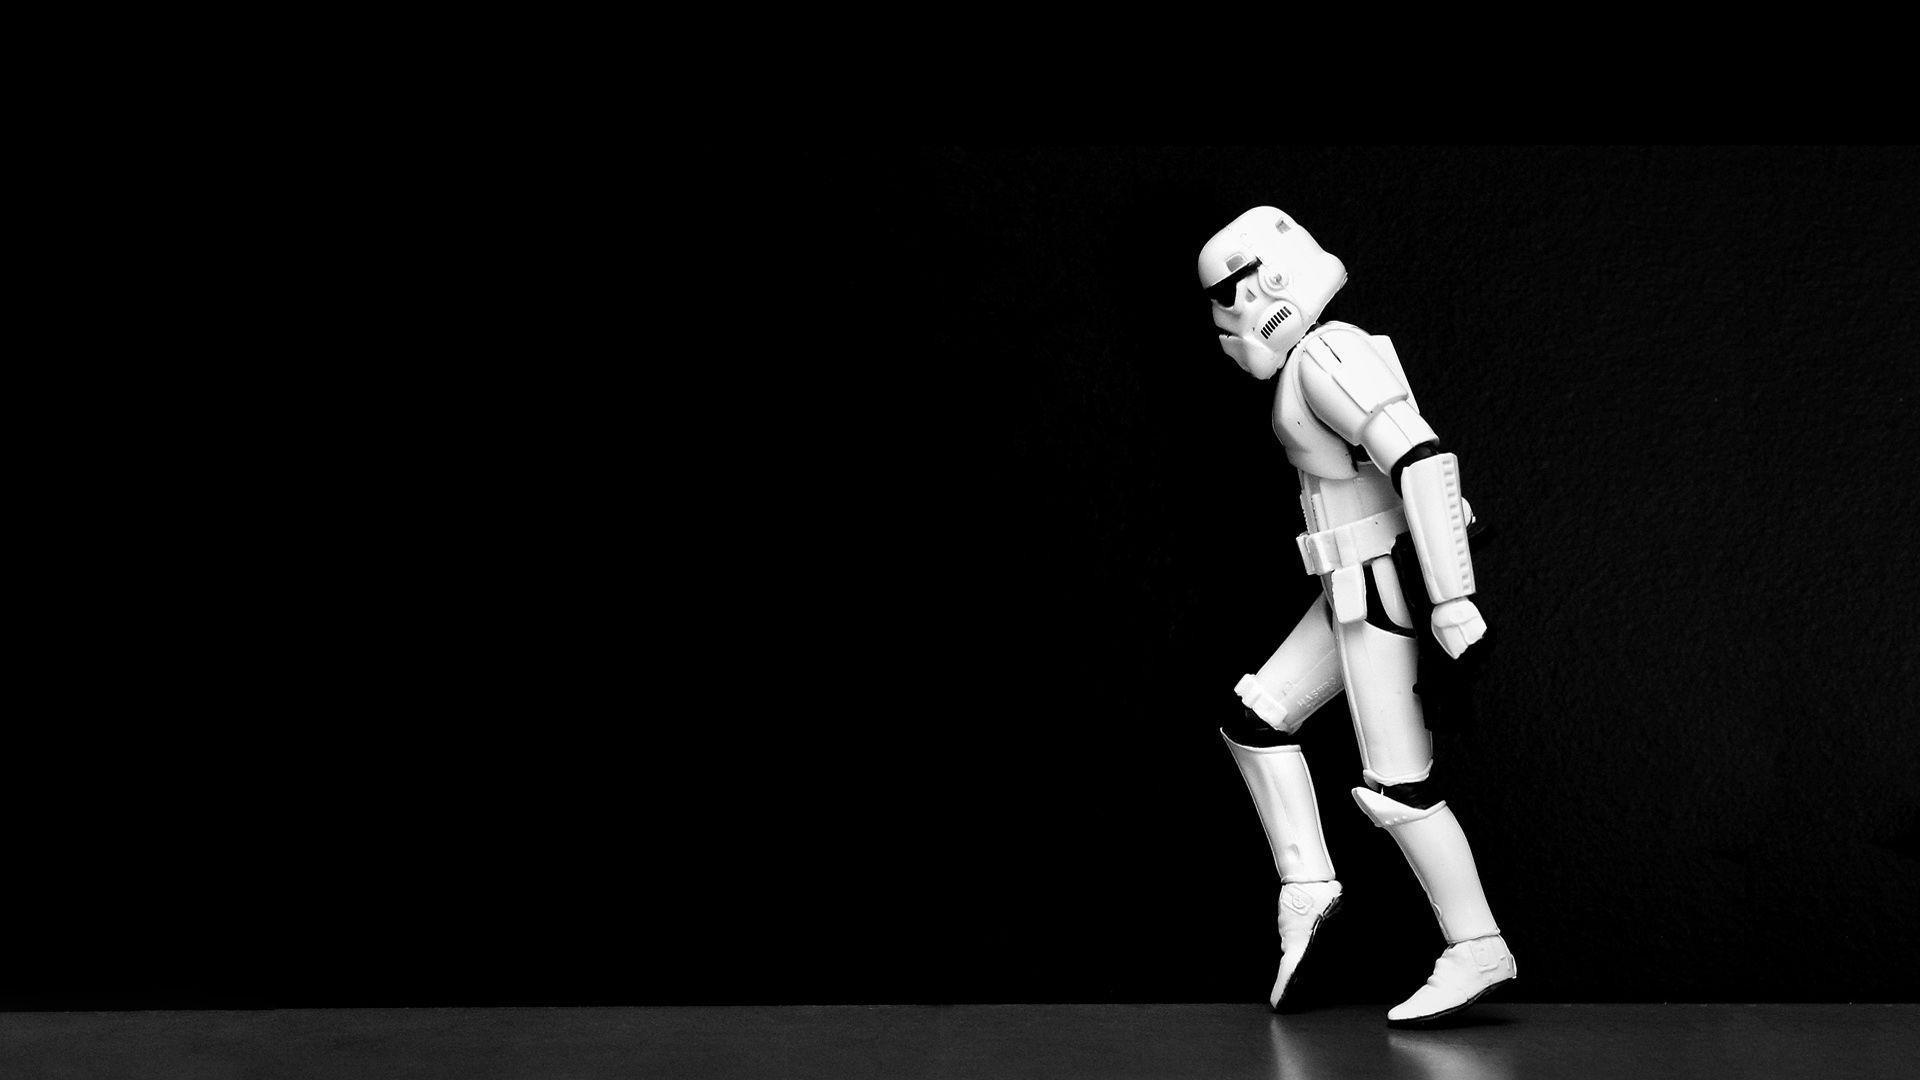 Imperial <b>Stormtrooper Wallpaper</b>, Top <b>HD